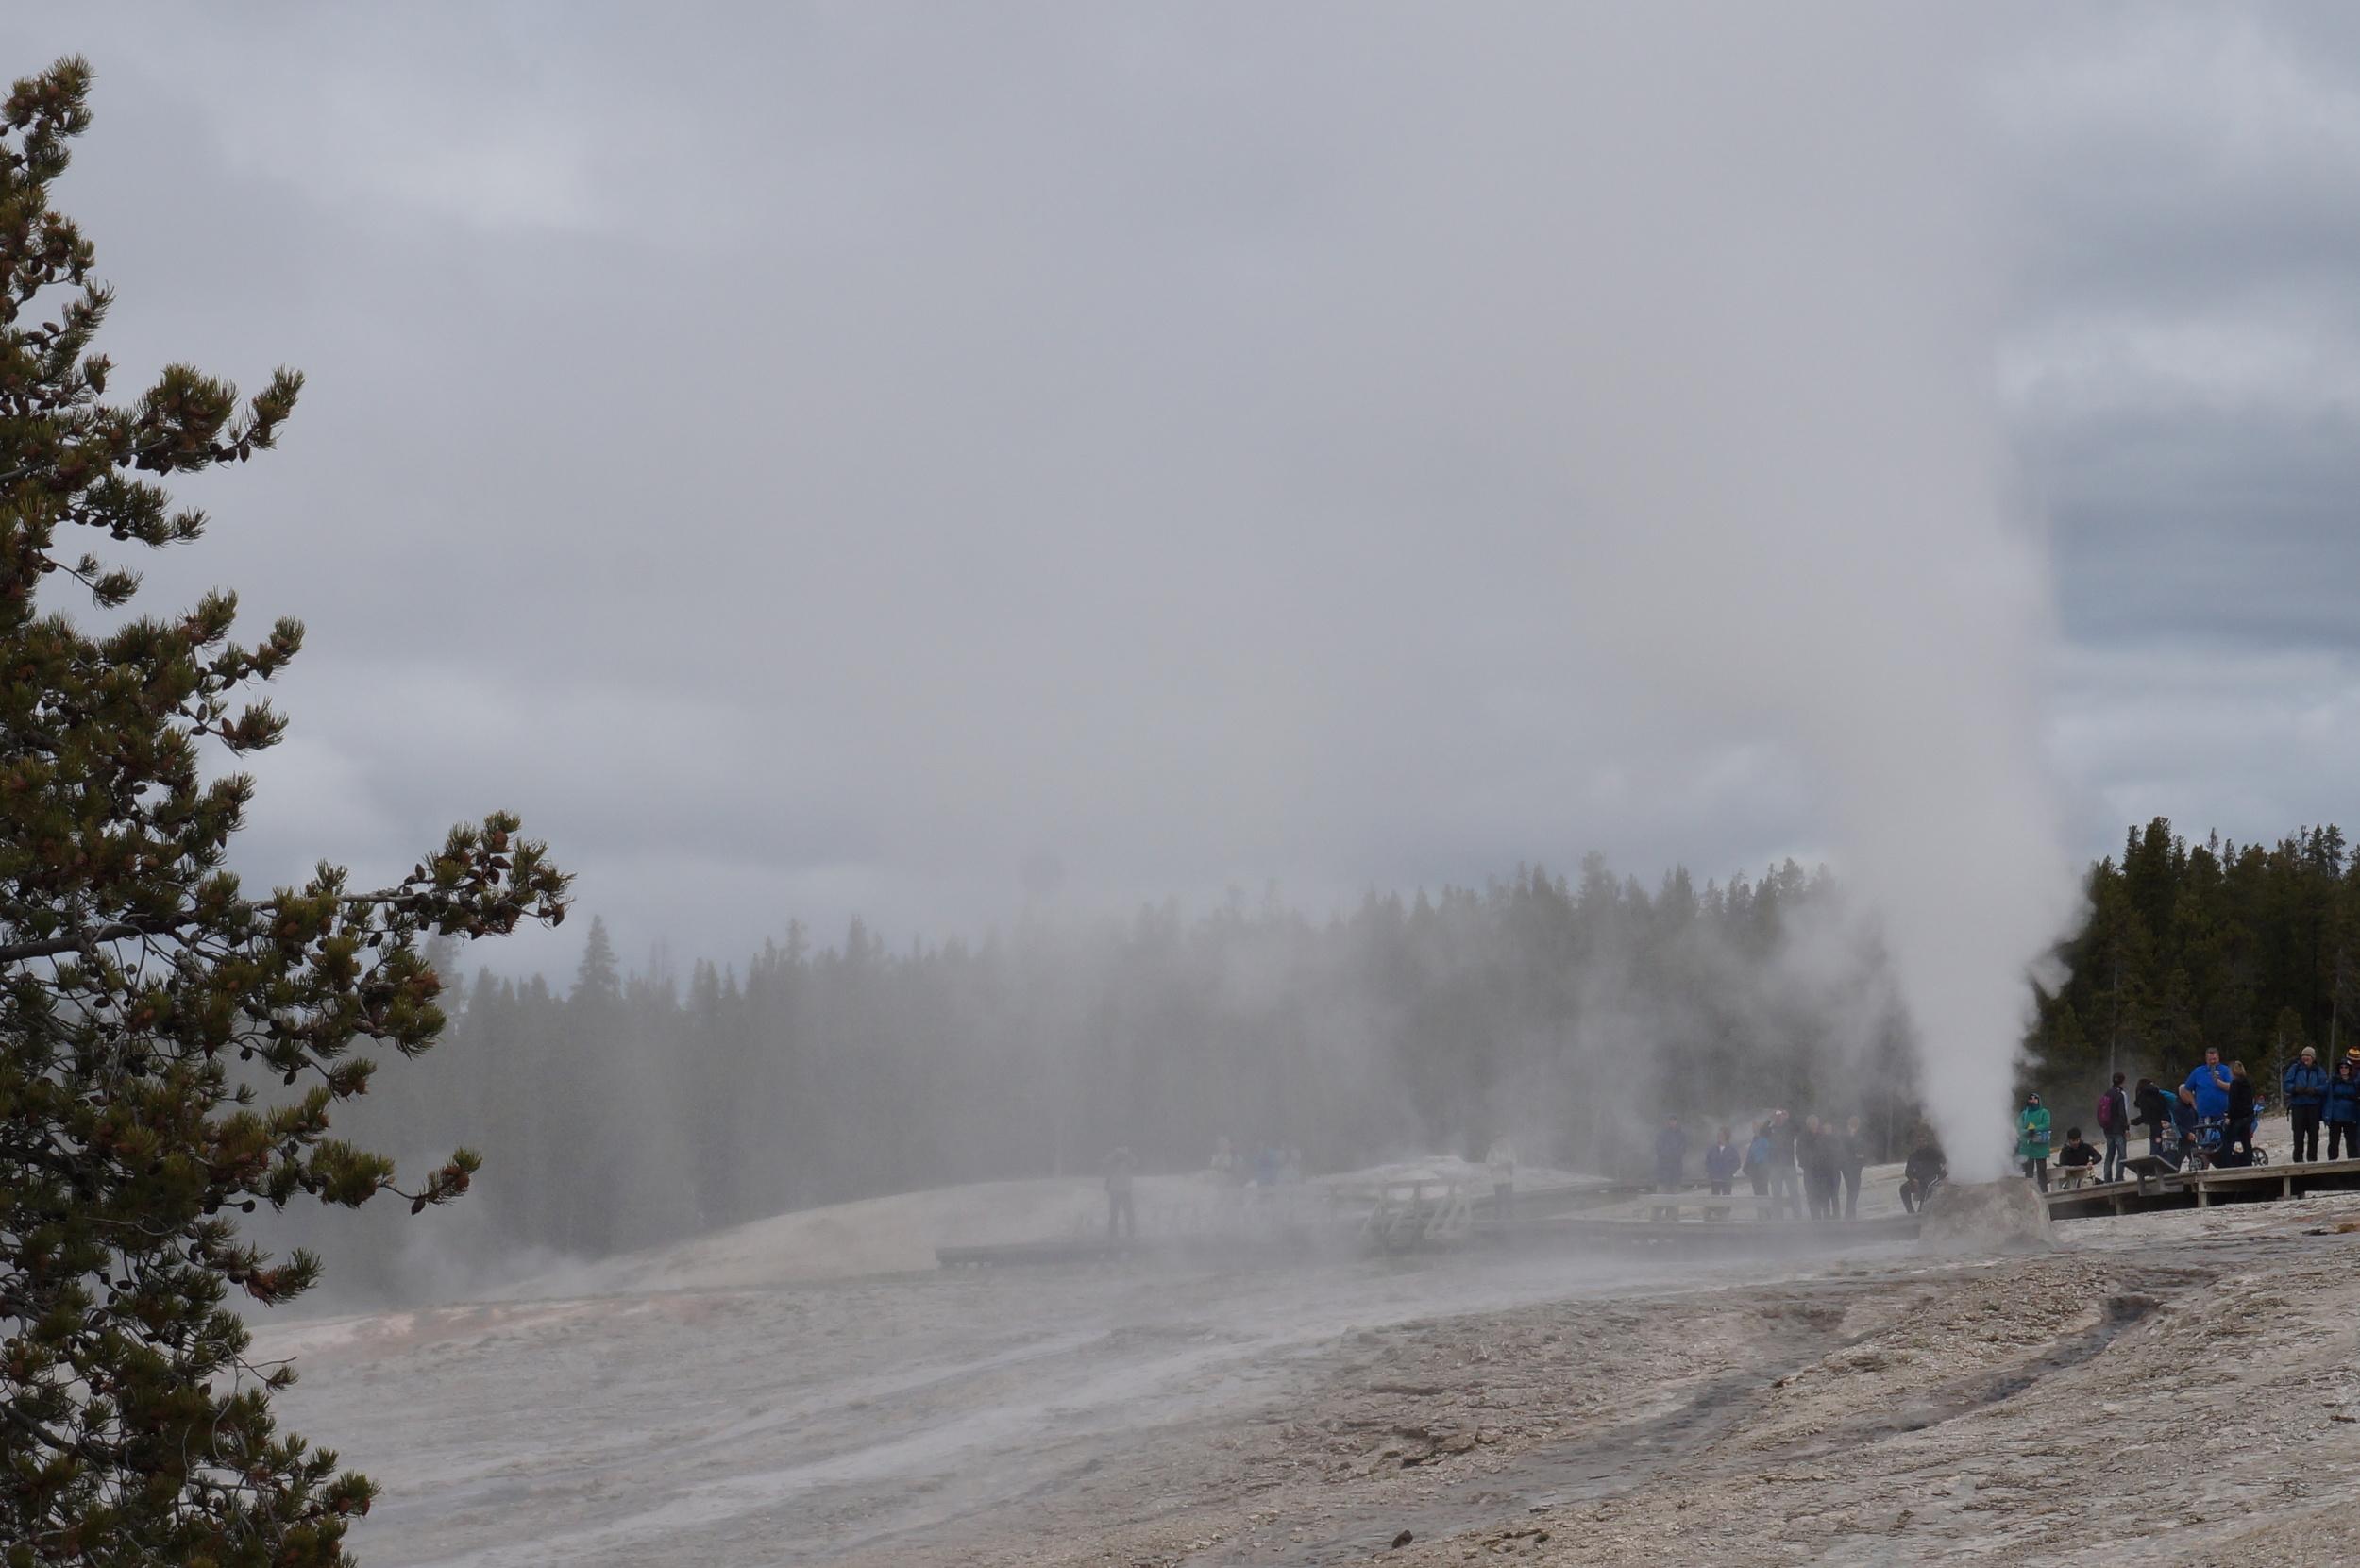 vanlife-rv-campervan-rent-idaho-sun-valley-boise-wandervans-wanderlust-skiing-snowboard-biking-hiking-outsidevan-Wandervans-idaho-yellowstone-national-park